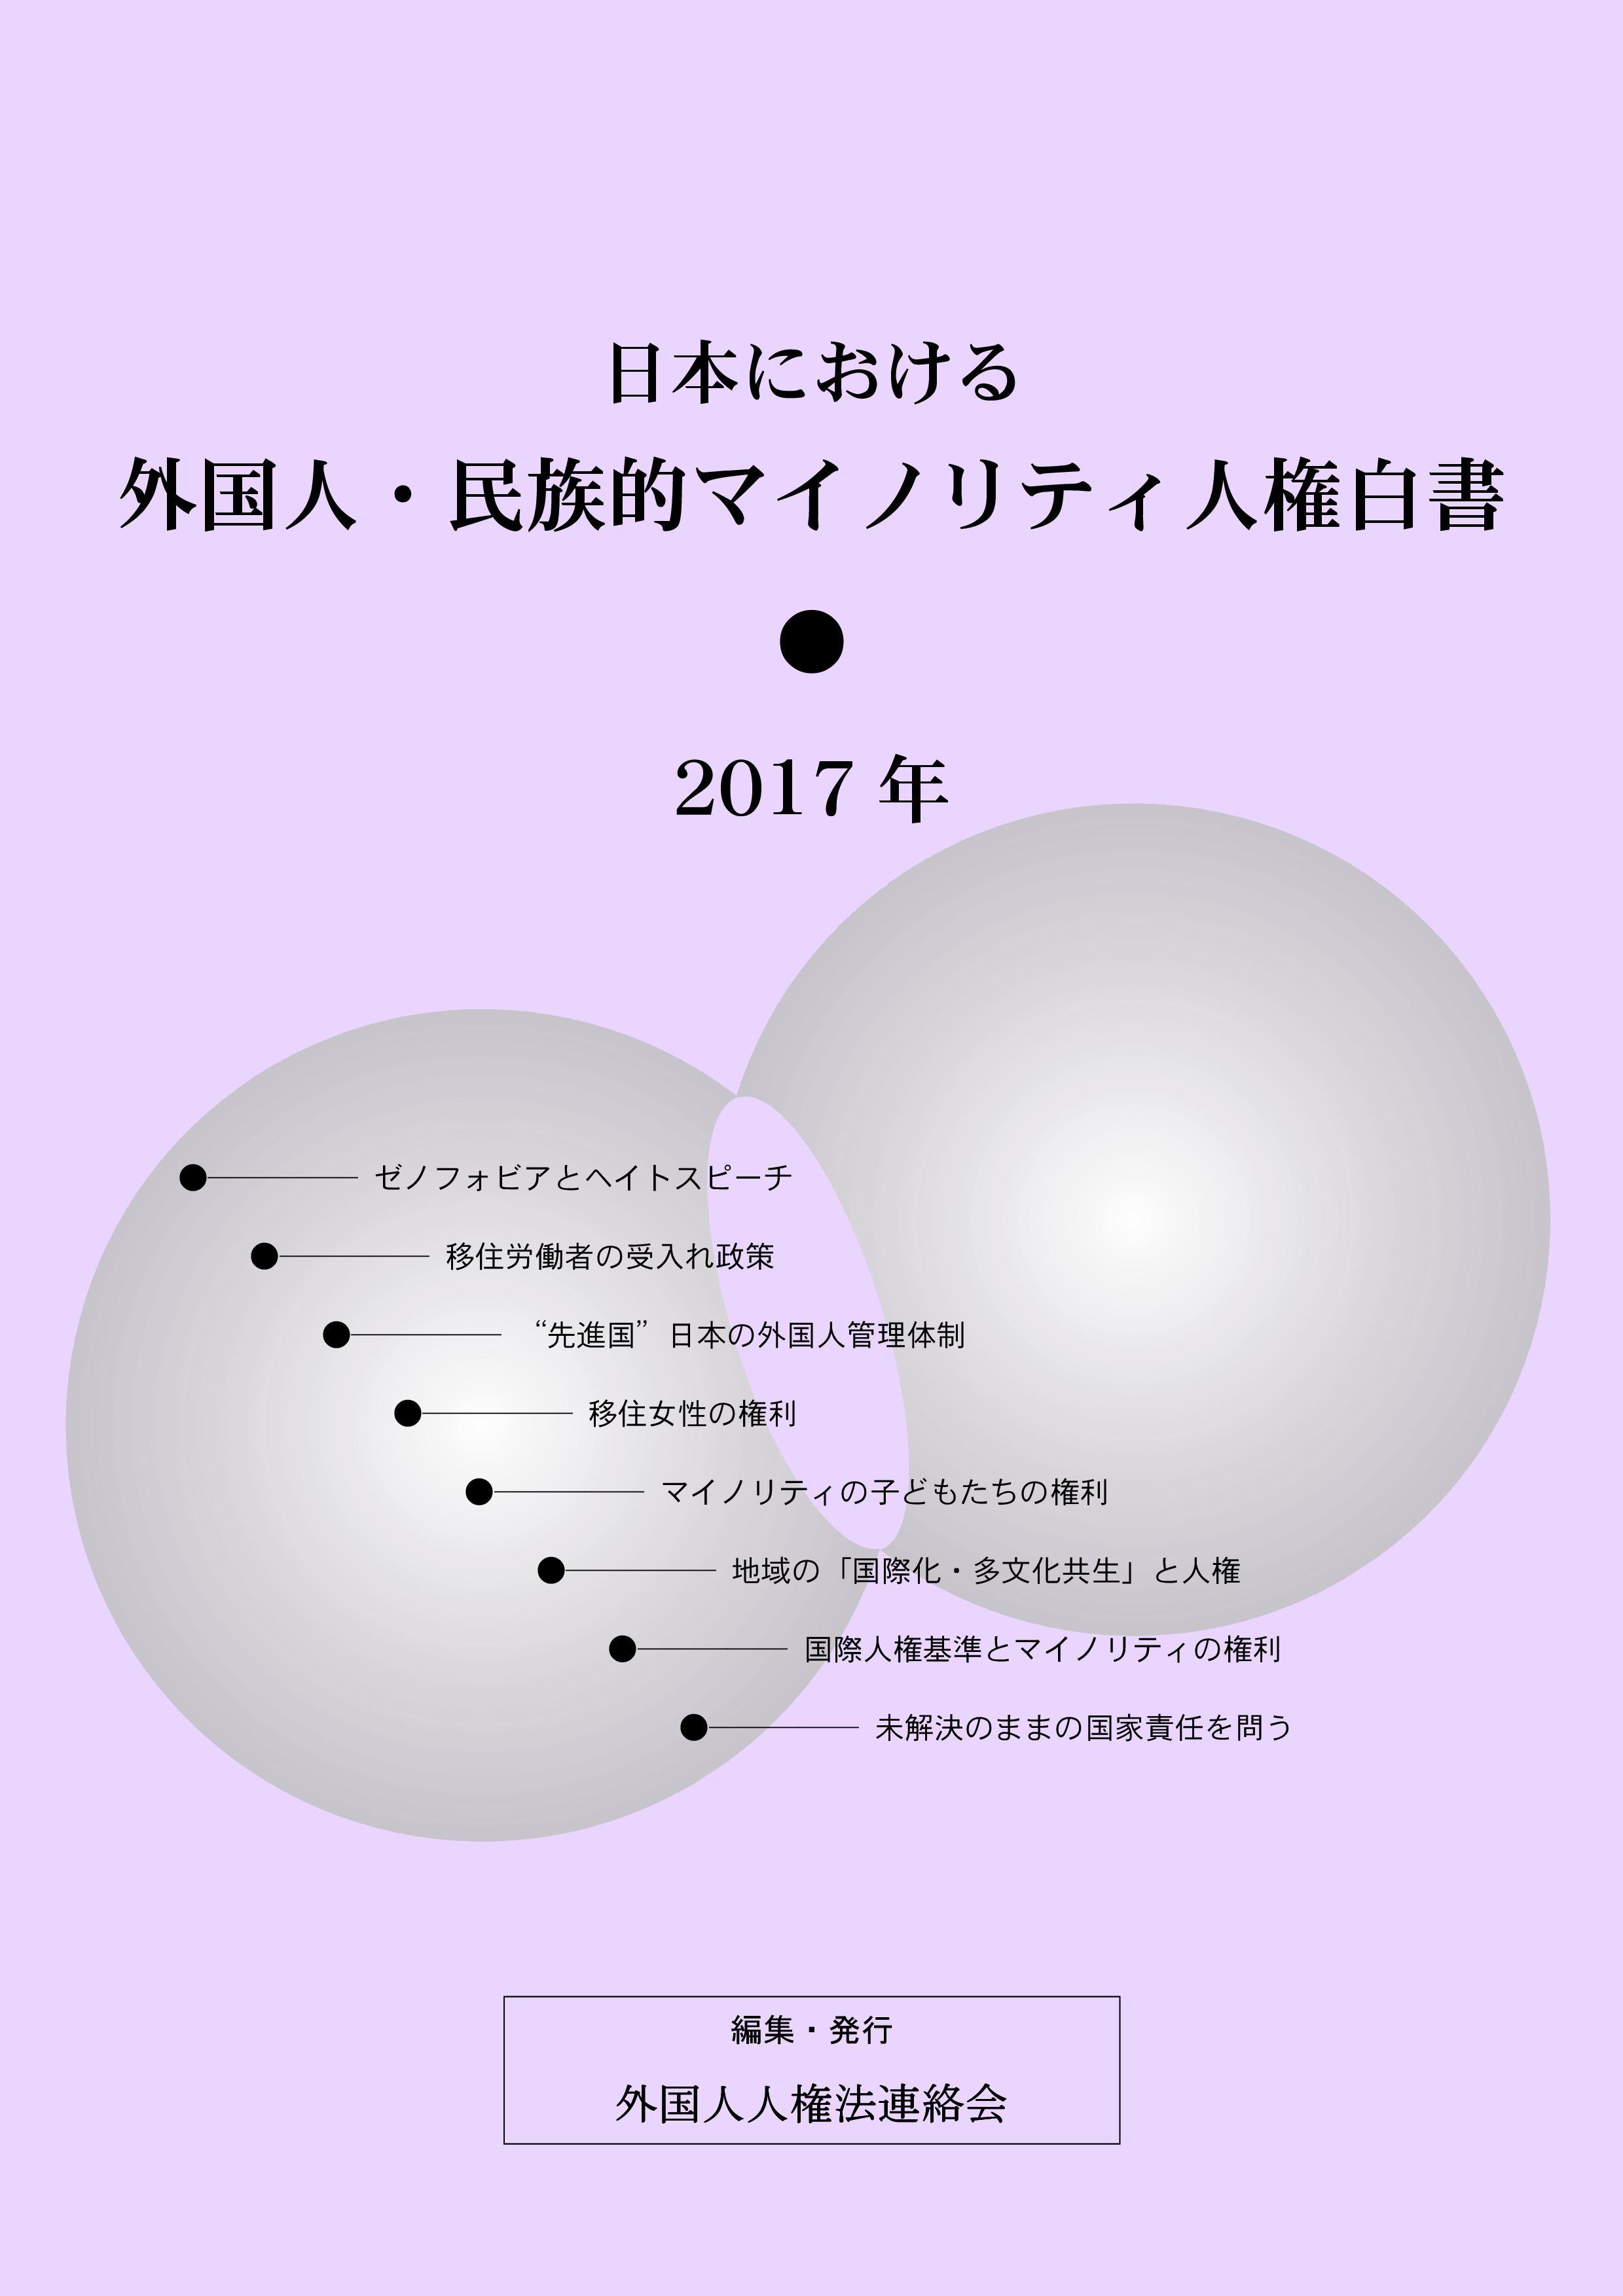 jinkenhakusho2017